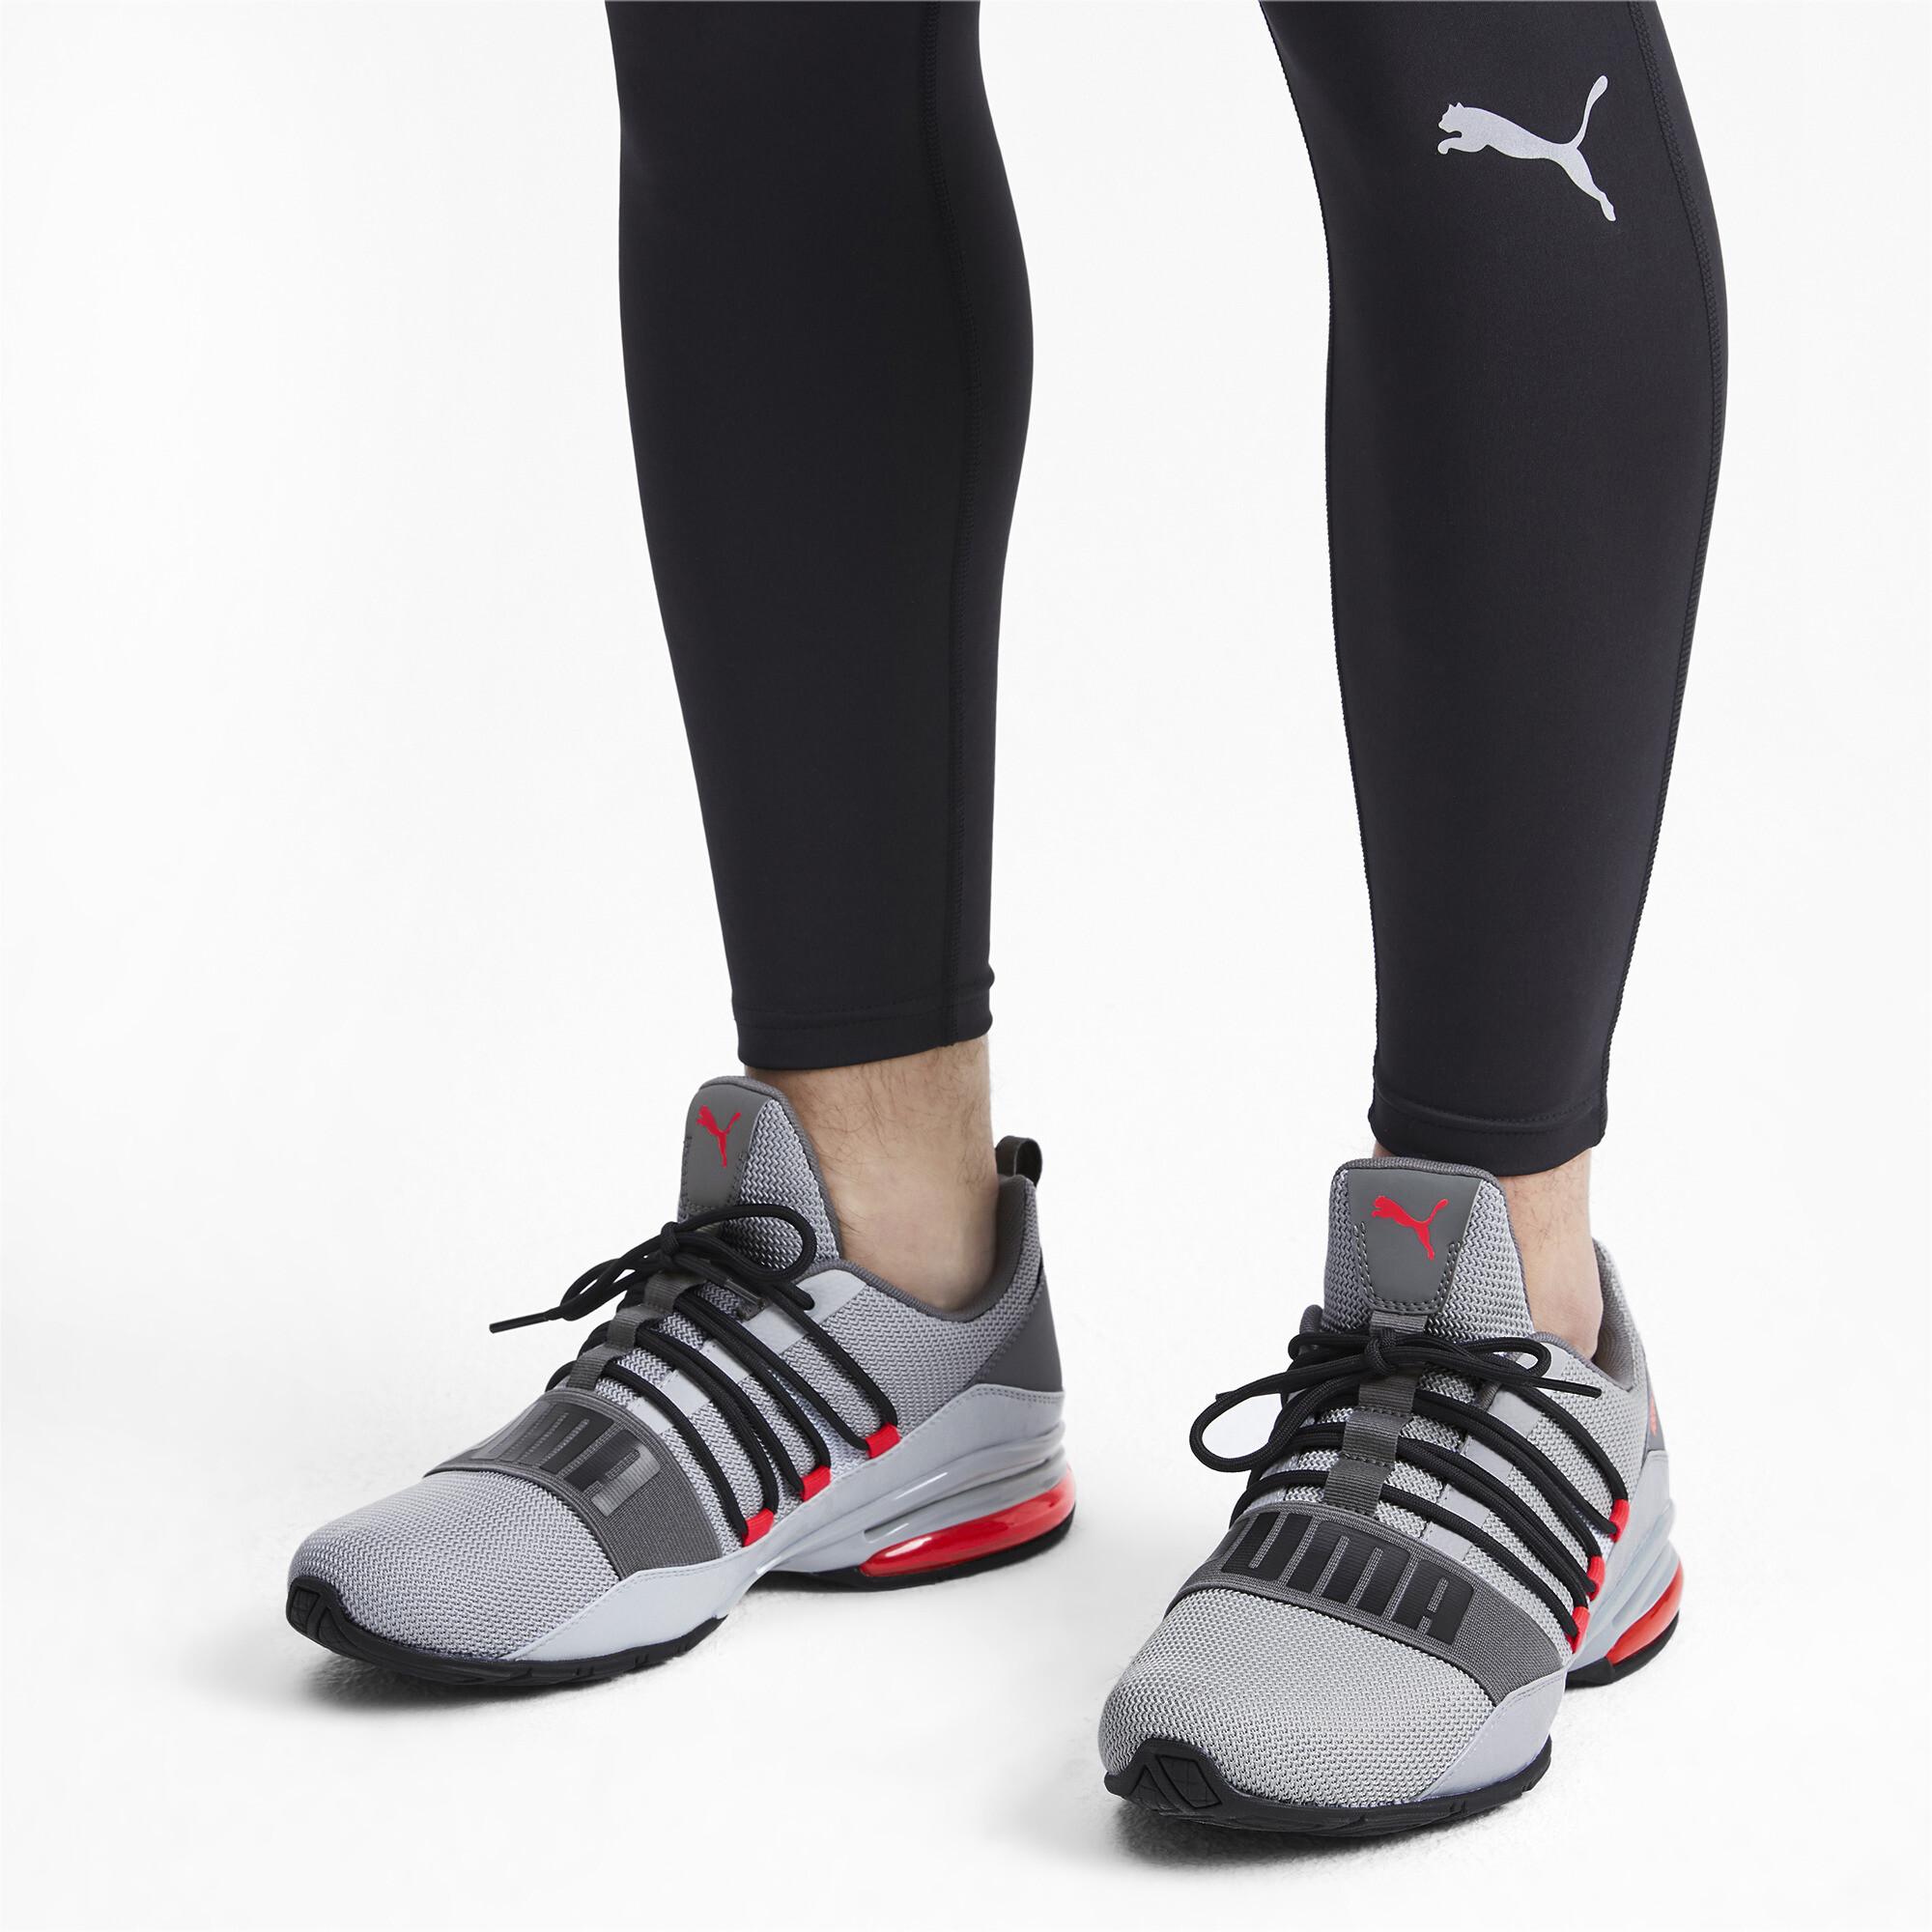 PUMA-CELL-Regulate-Camo-Men-s-Training-Shoes-Men-Shoe-Running thumbnail 5